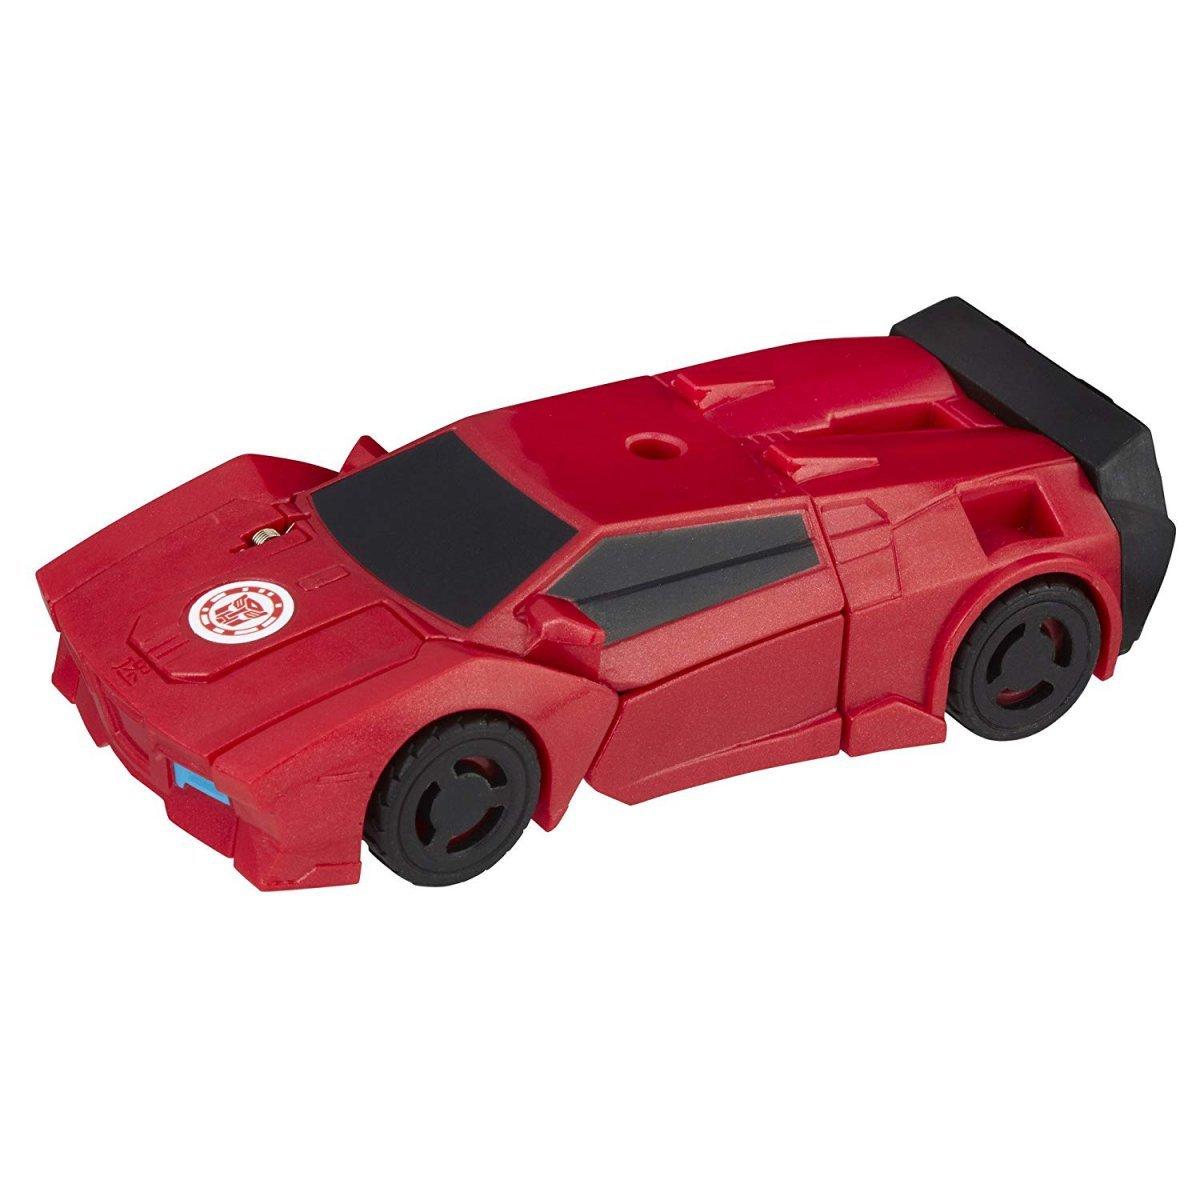 Transformers Combiner Force Sideswipe - Hasbro C0899